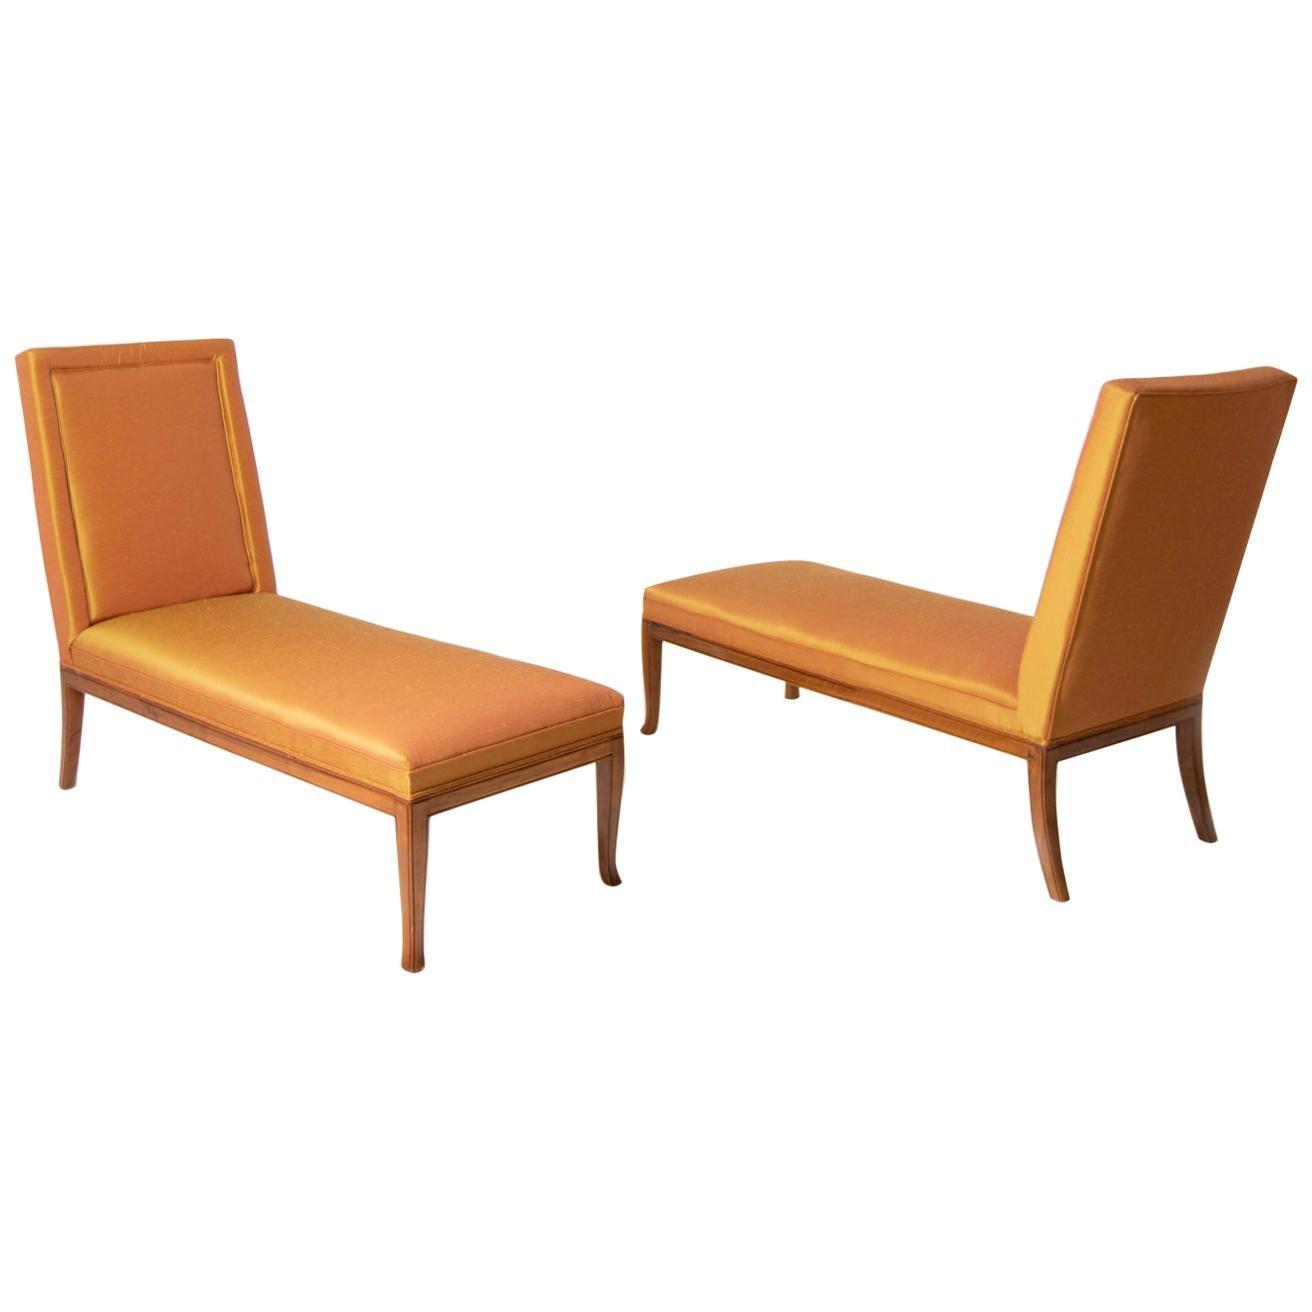 T.H. Robsjohn-Gibbings Pair of Chaise Lounges in Orange Silk, 1960s